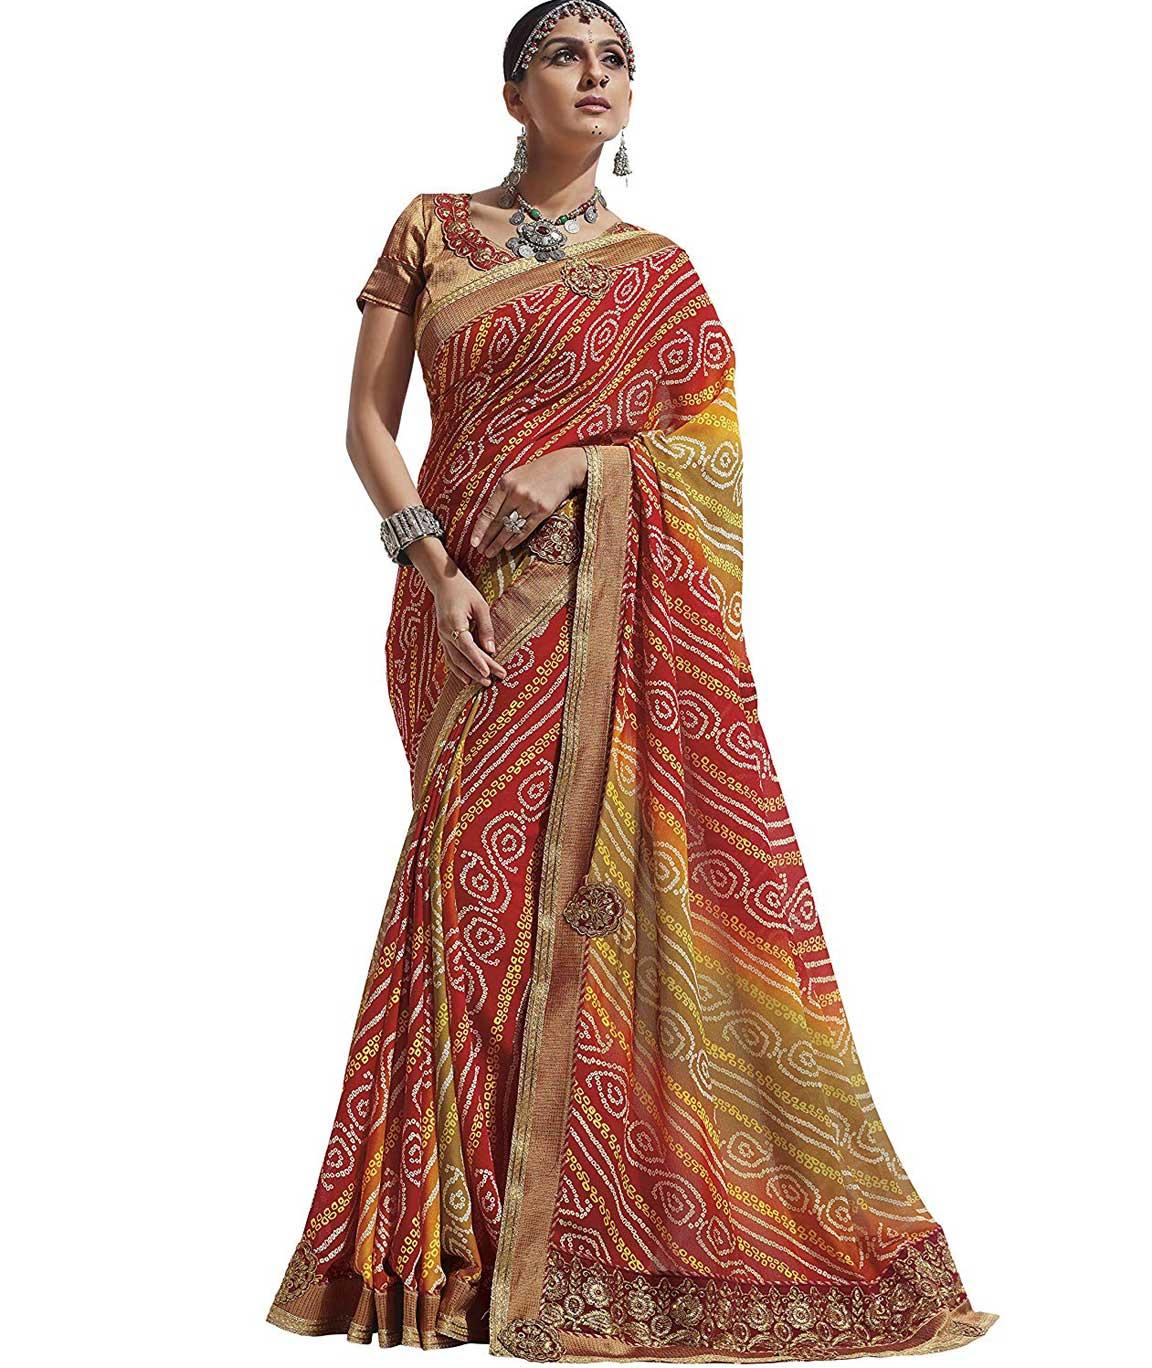 Shangrila Designer Women`s Georgette Bandhej Printed Zari Lace Border Saree with Blouse (RYLBDH3-5365 Multi Shades)